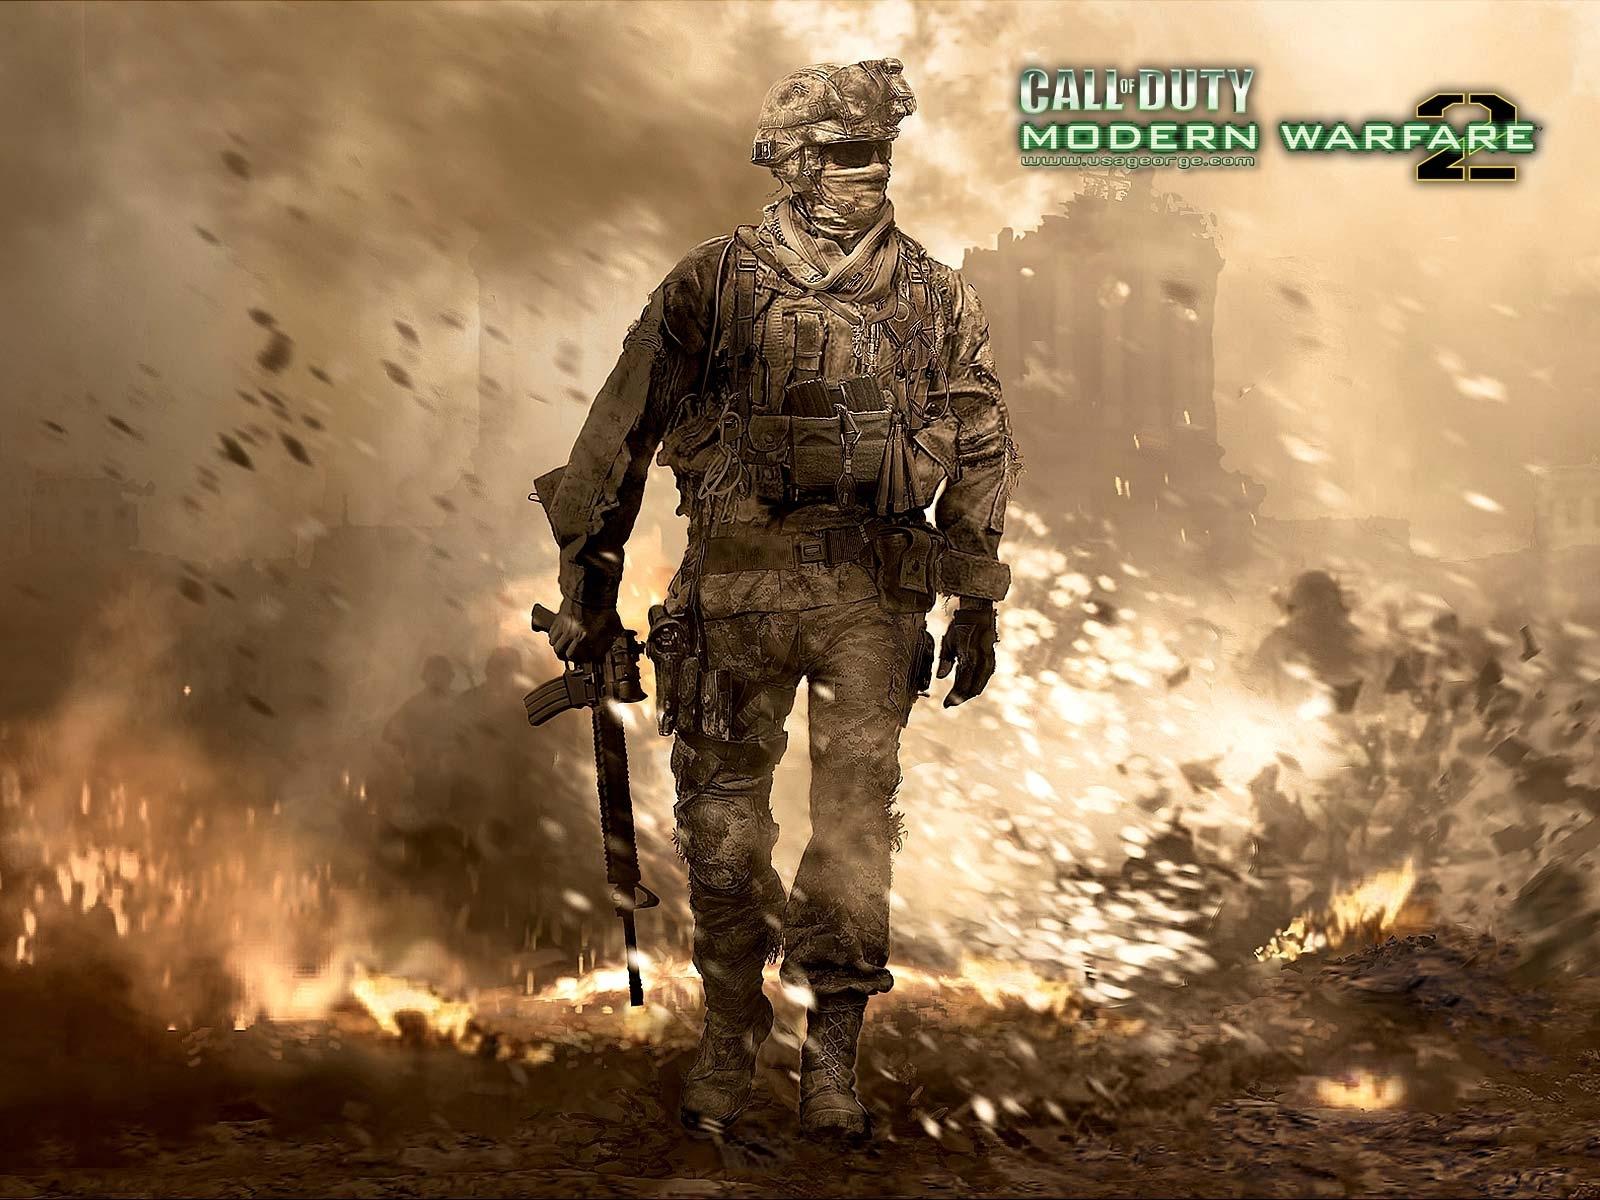 call of duty modern warfare 2 wallpapers | hd wallpapers | id #7244